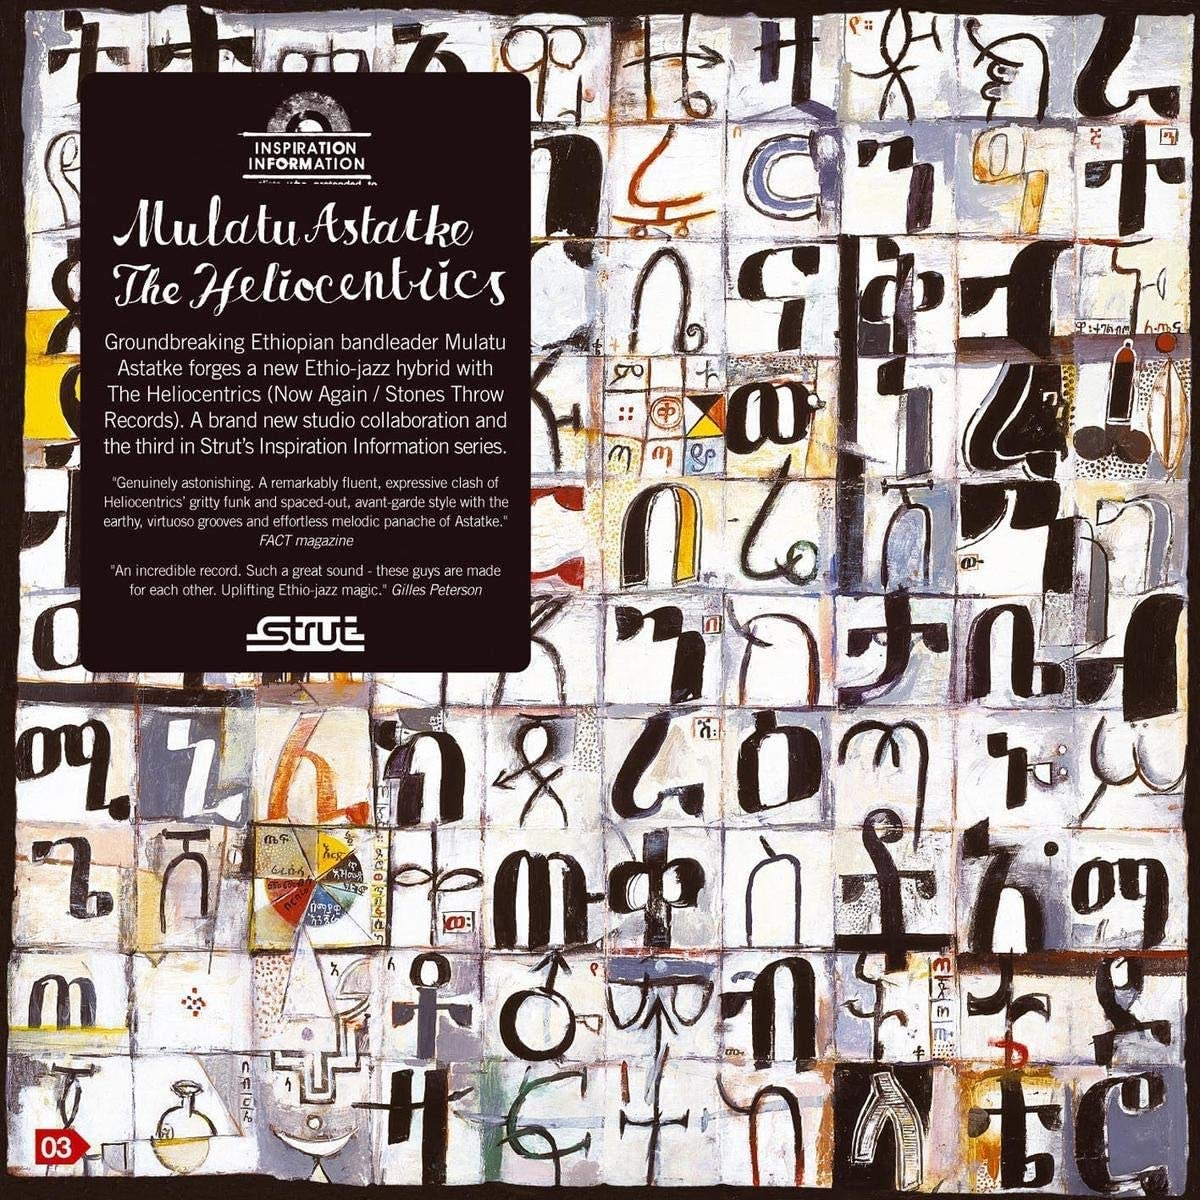 Mulatu Astatke /The Heliocentrics – Inspiration Information